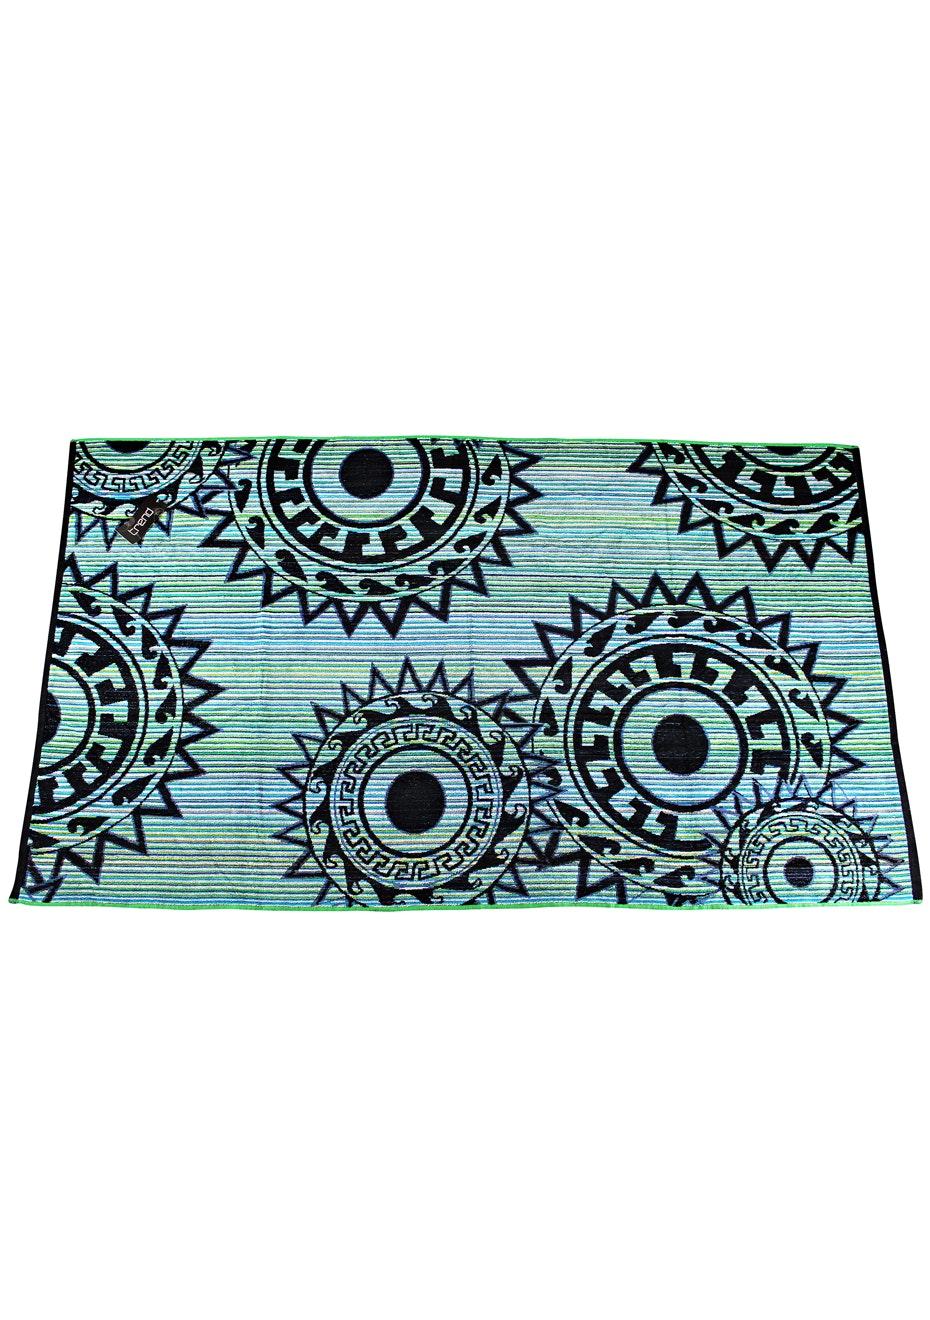 Ayana 100% Cotton Velour Jacquard Beach Towel - 100x180cm